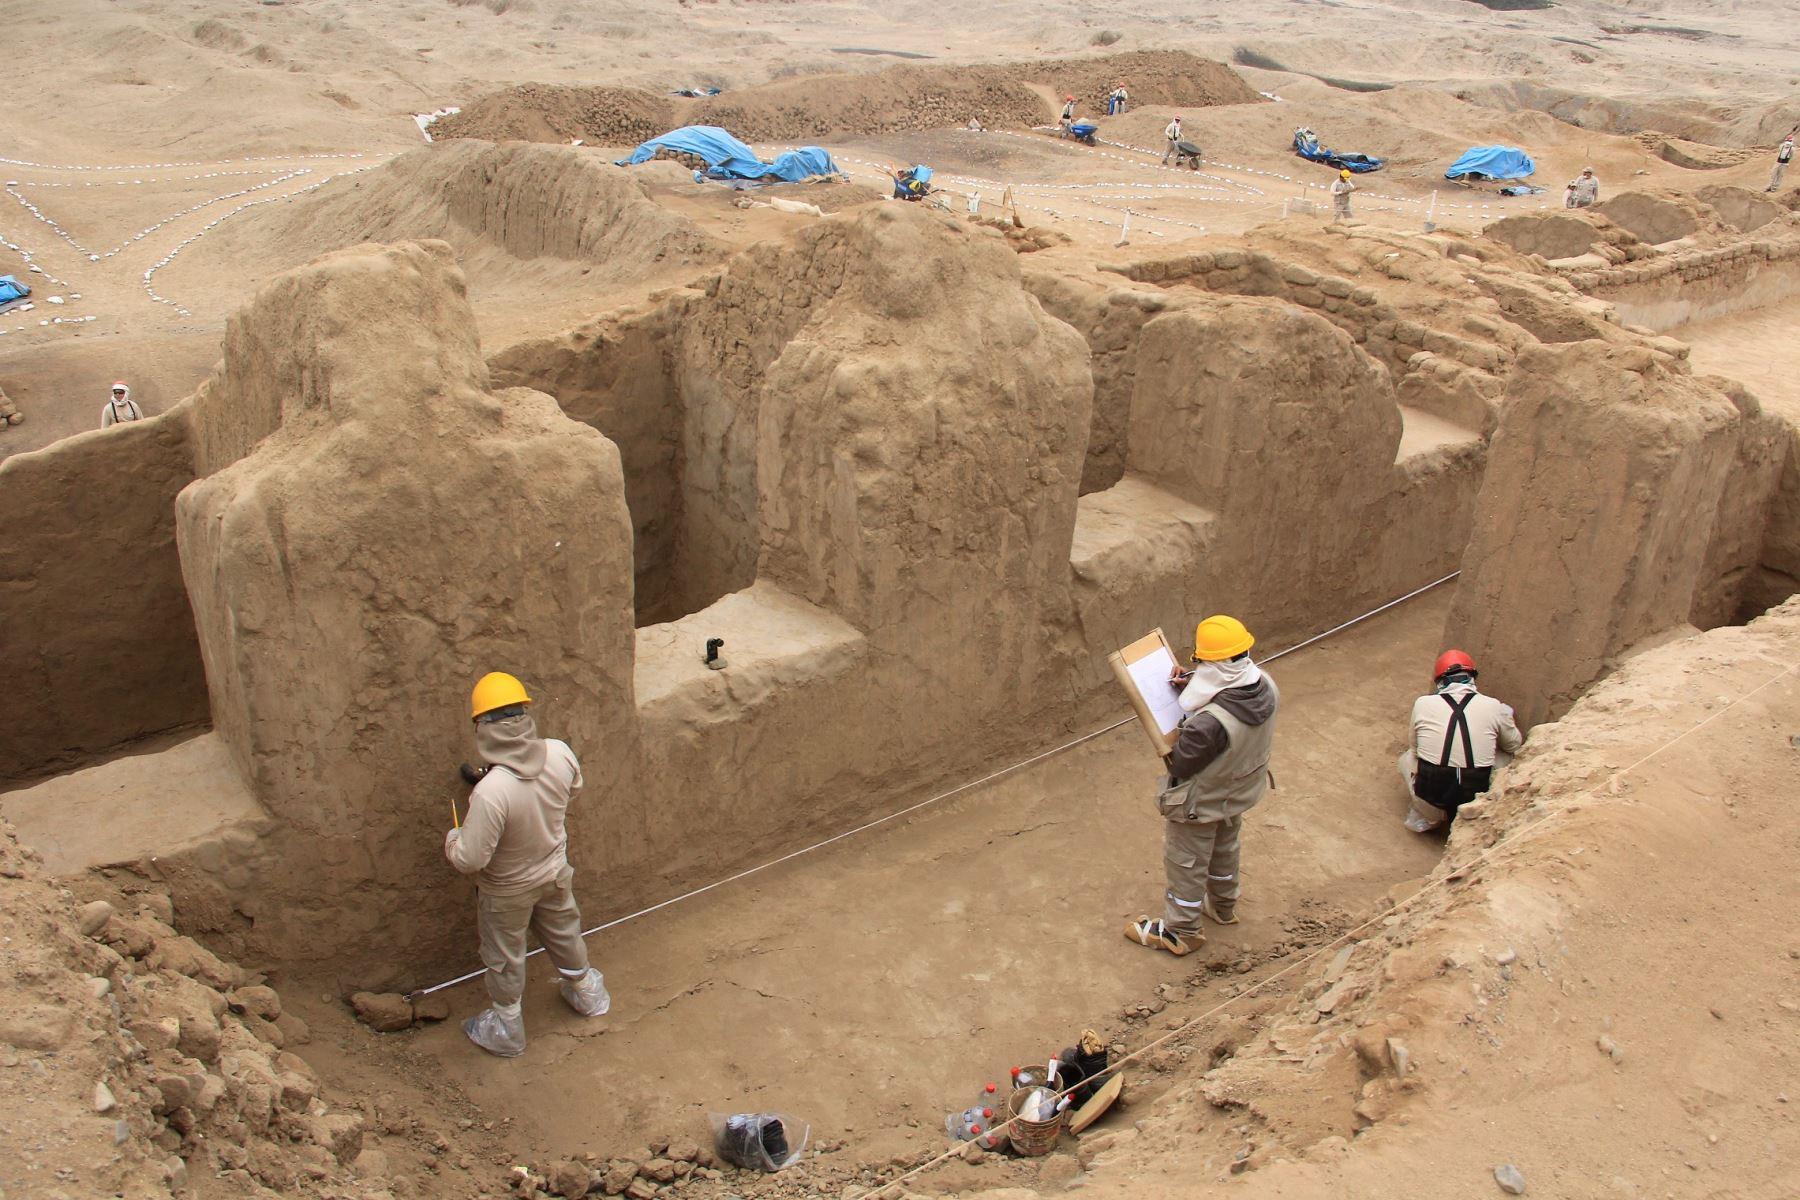 Hallazgo en conjunto amurallado Utzh An, en Chan Chan, evidencia reocupación chimú-inca, afirman investigadores. ANDINA/Luis Puell